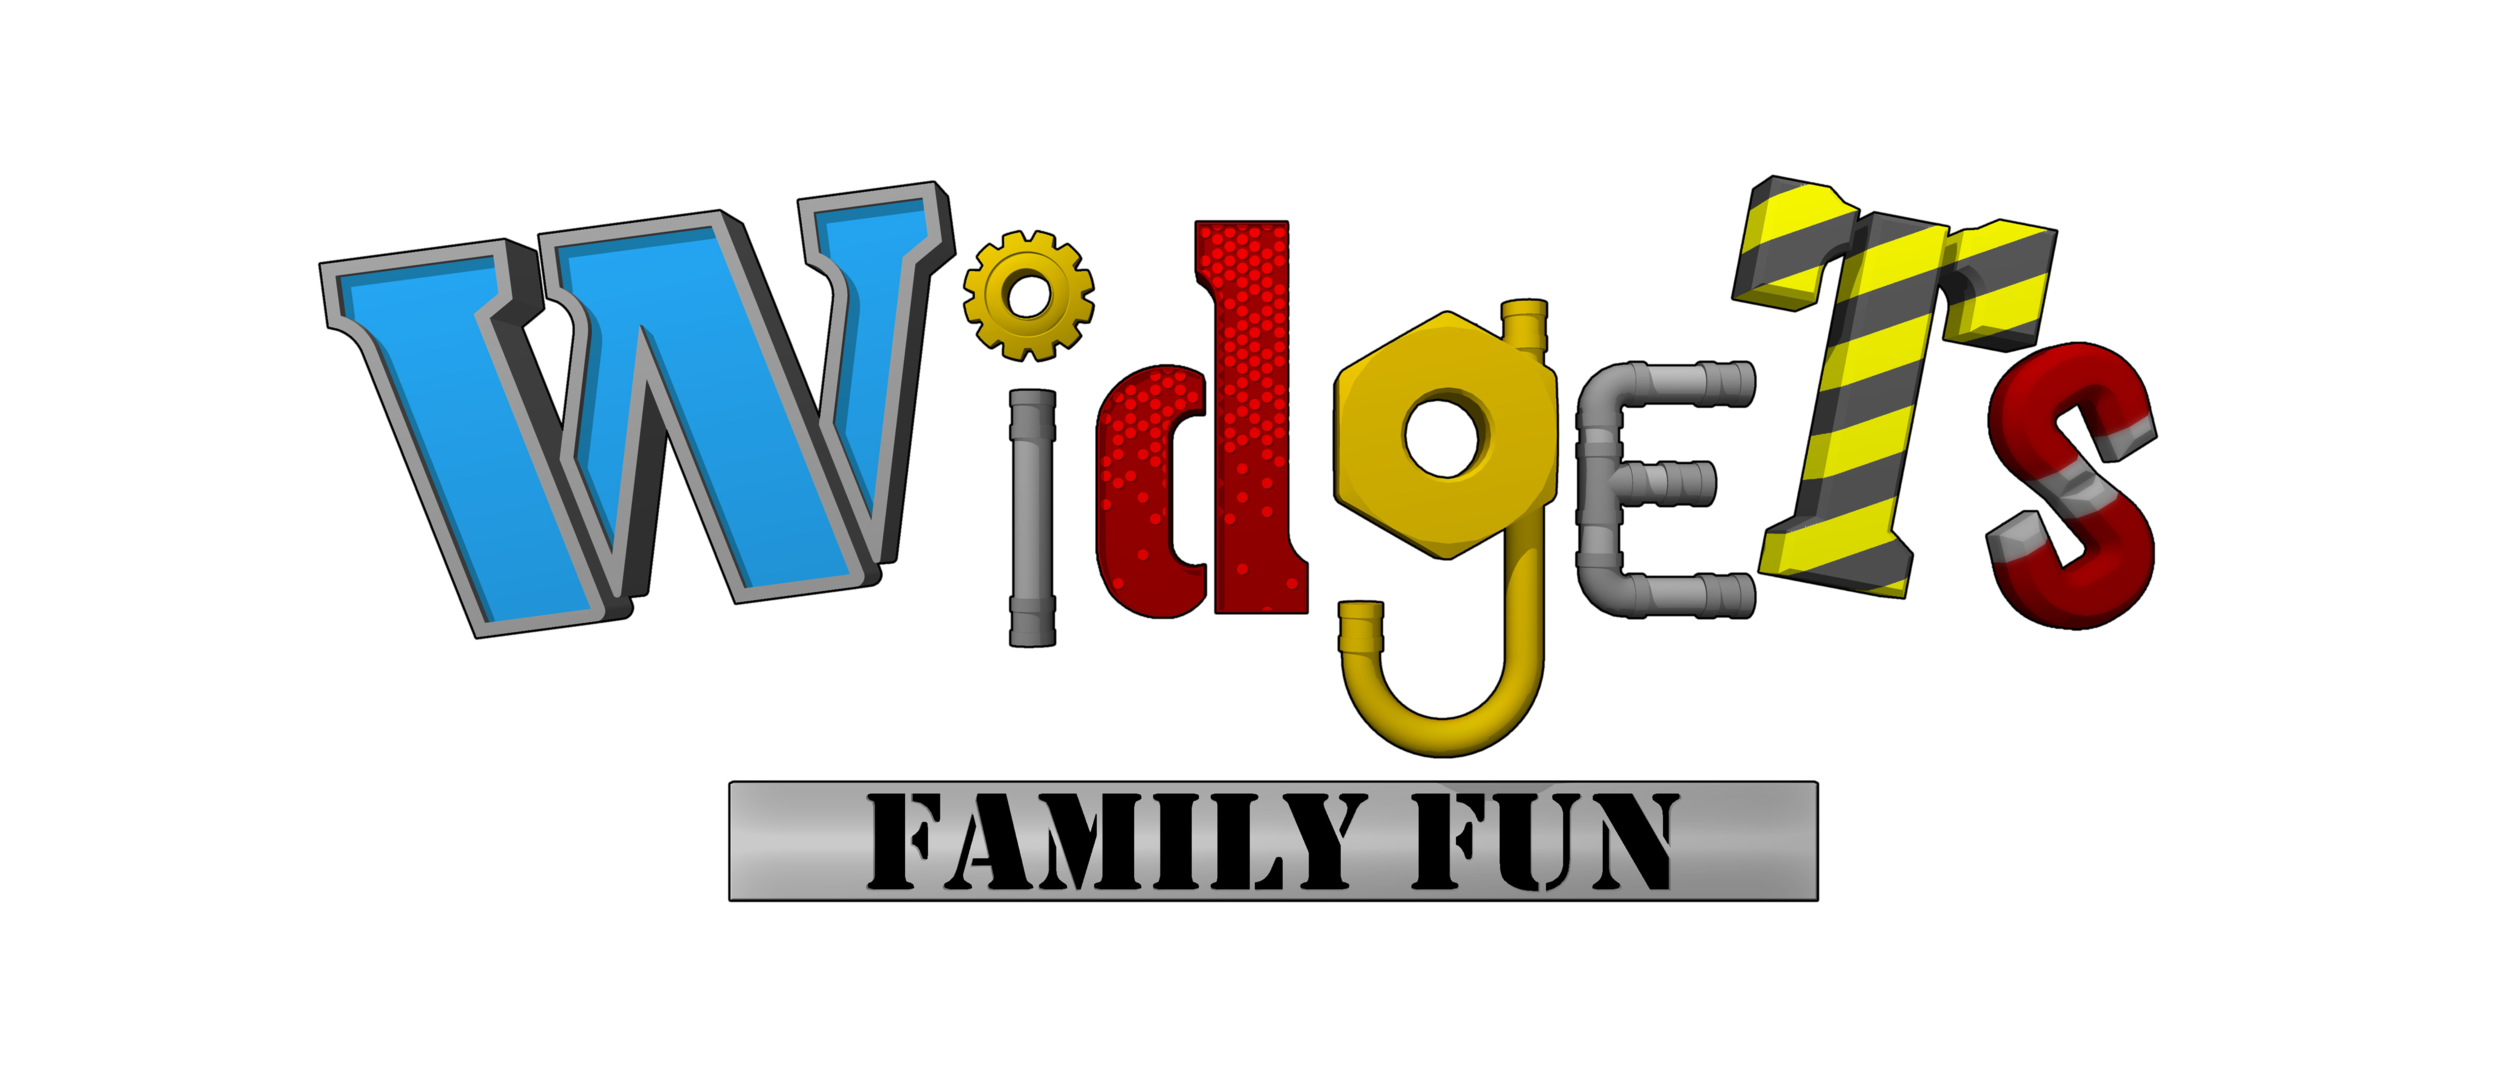 WidgetsLogo_web.png